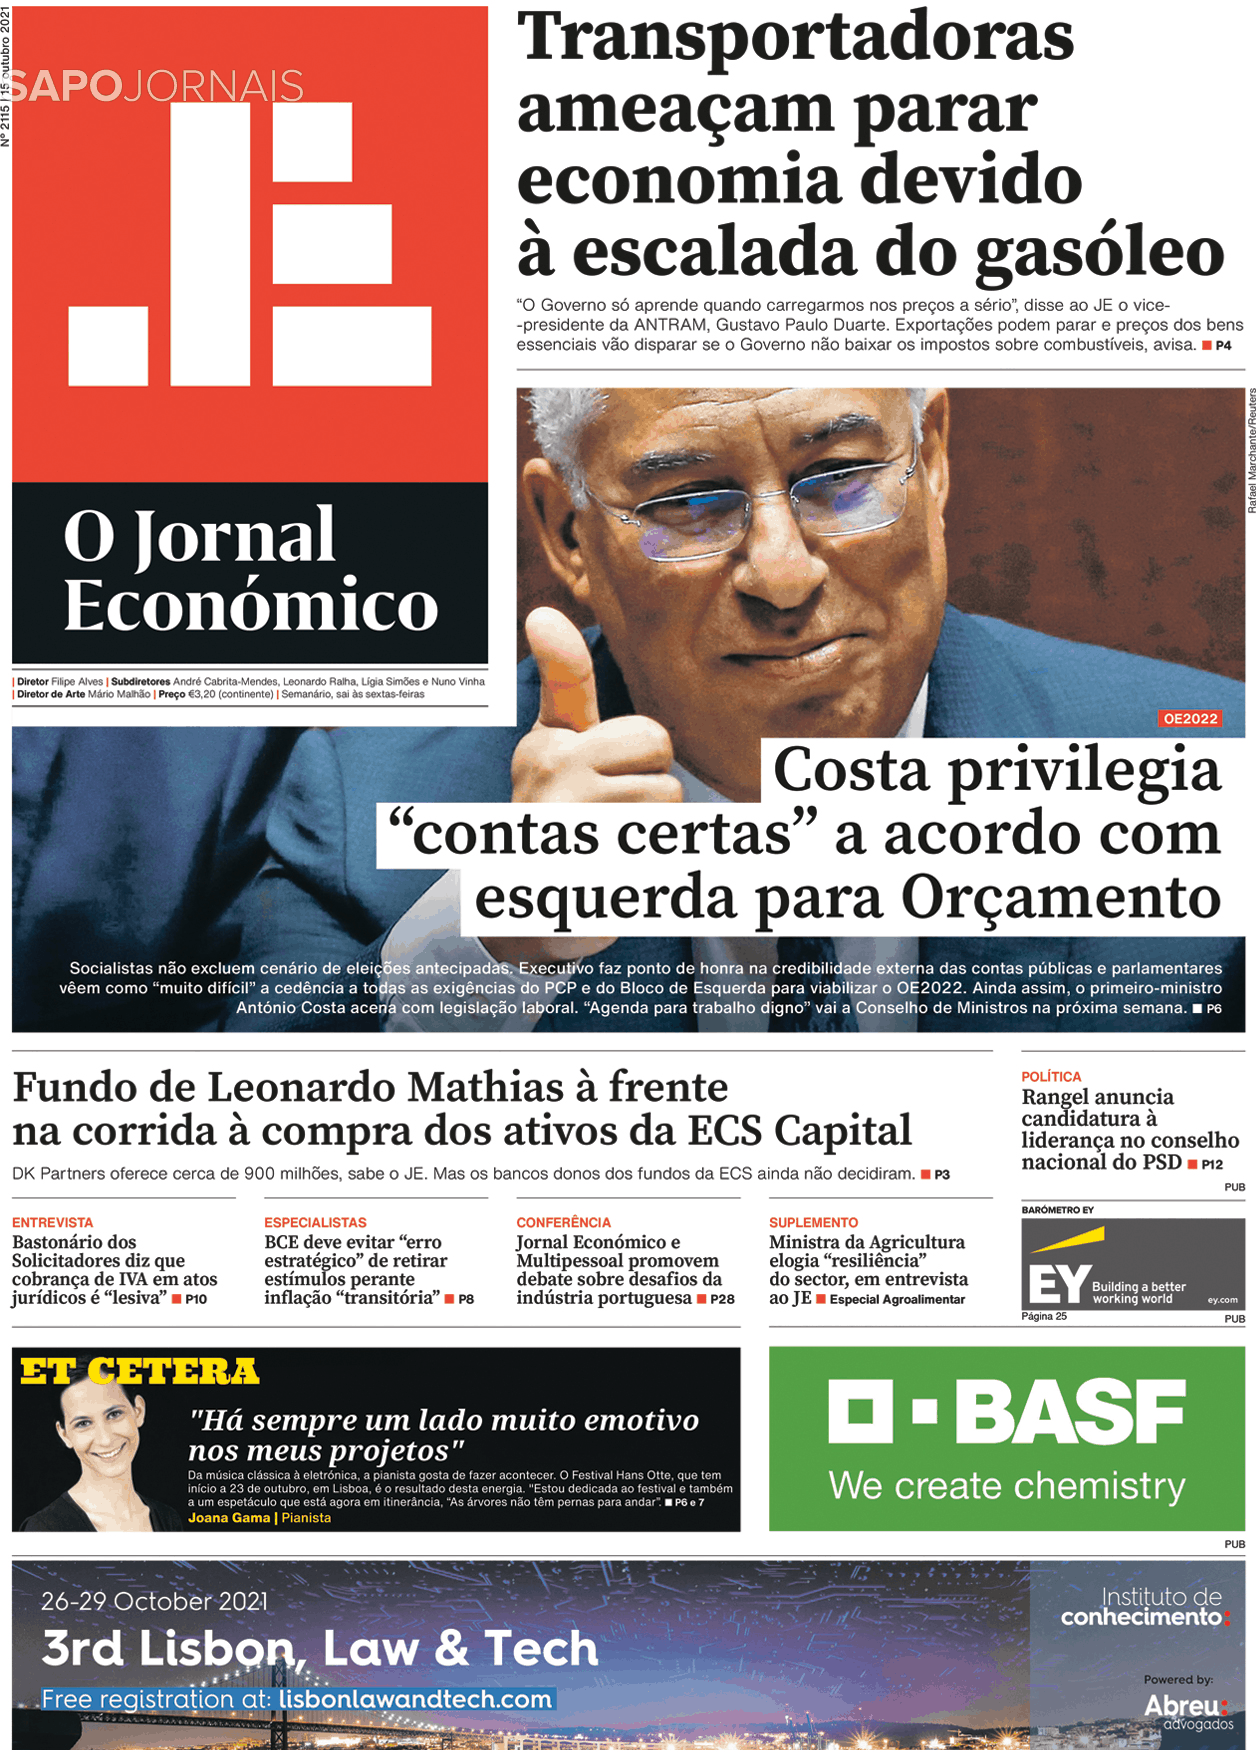 O Jornal Económico